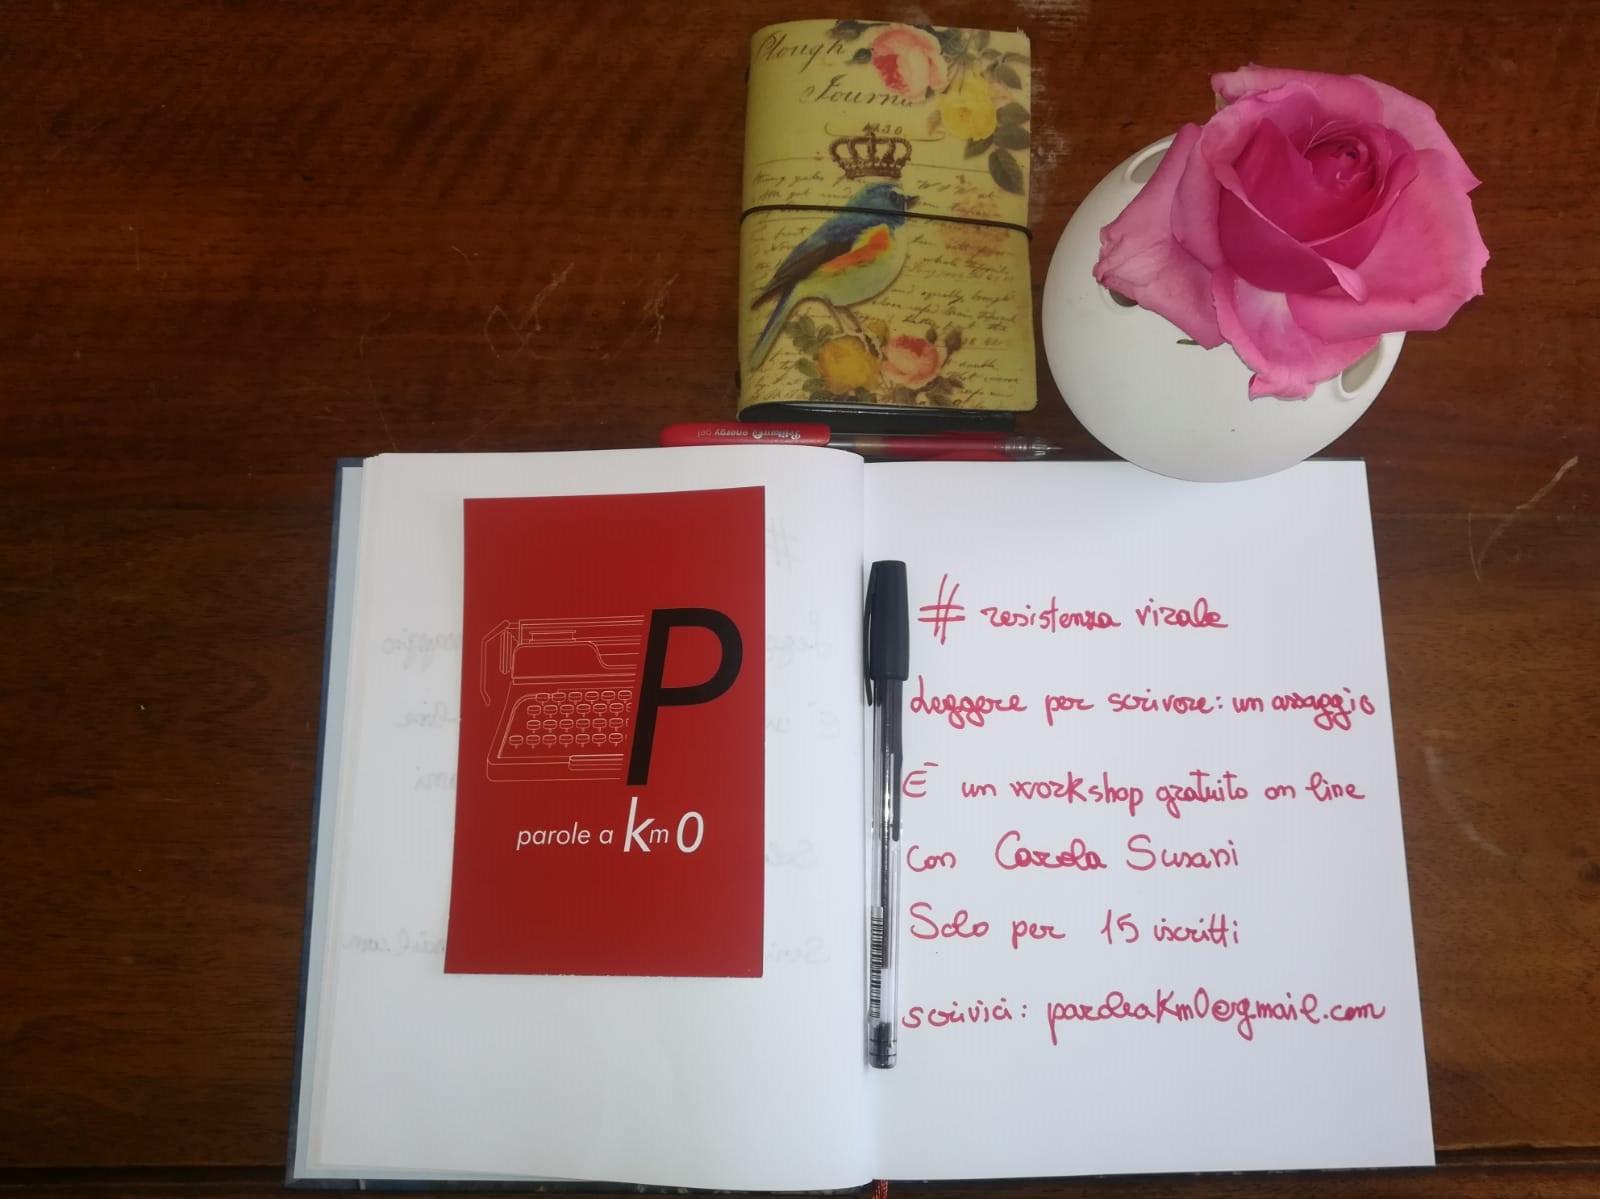 Viterbo, Coronavirus, Arci, Leggere per scrivere, workshop  on line con Carola Susani